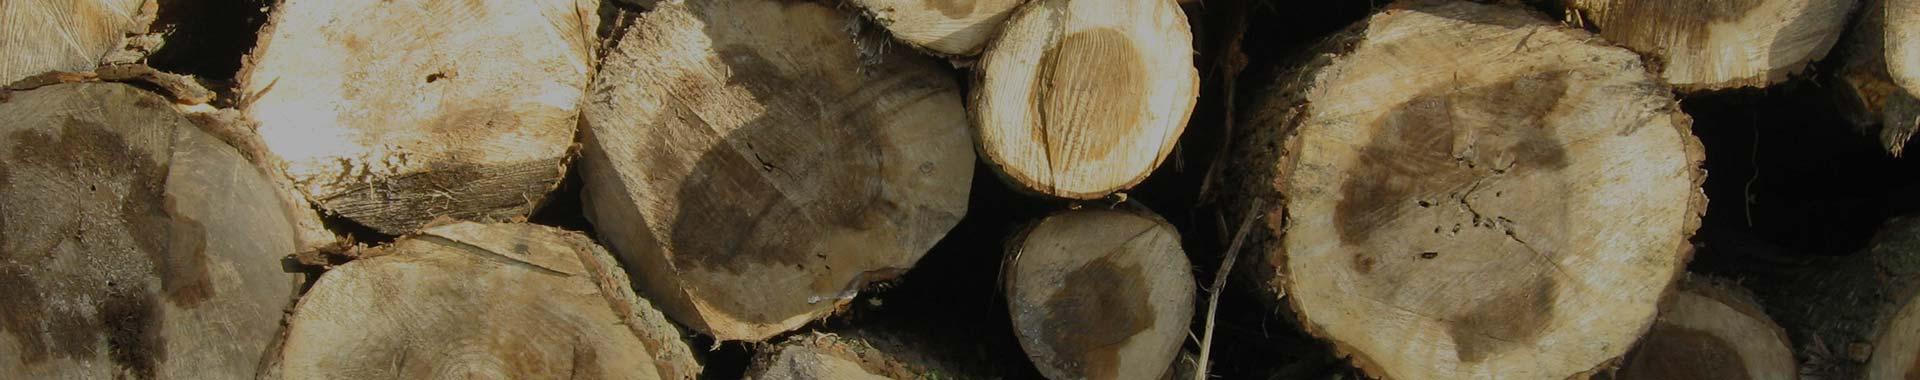 bois coupé